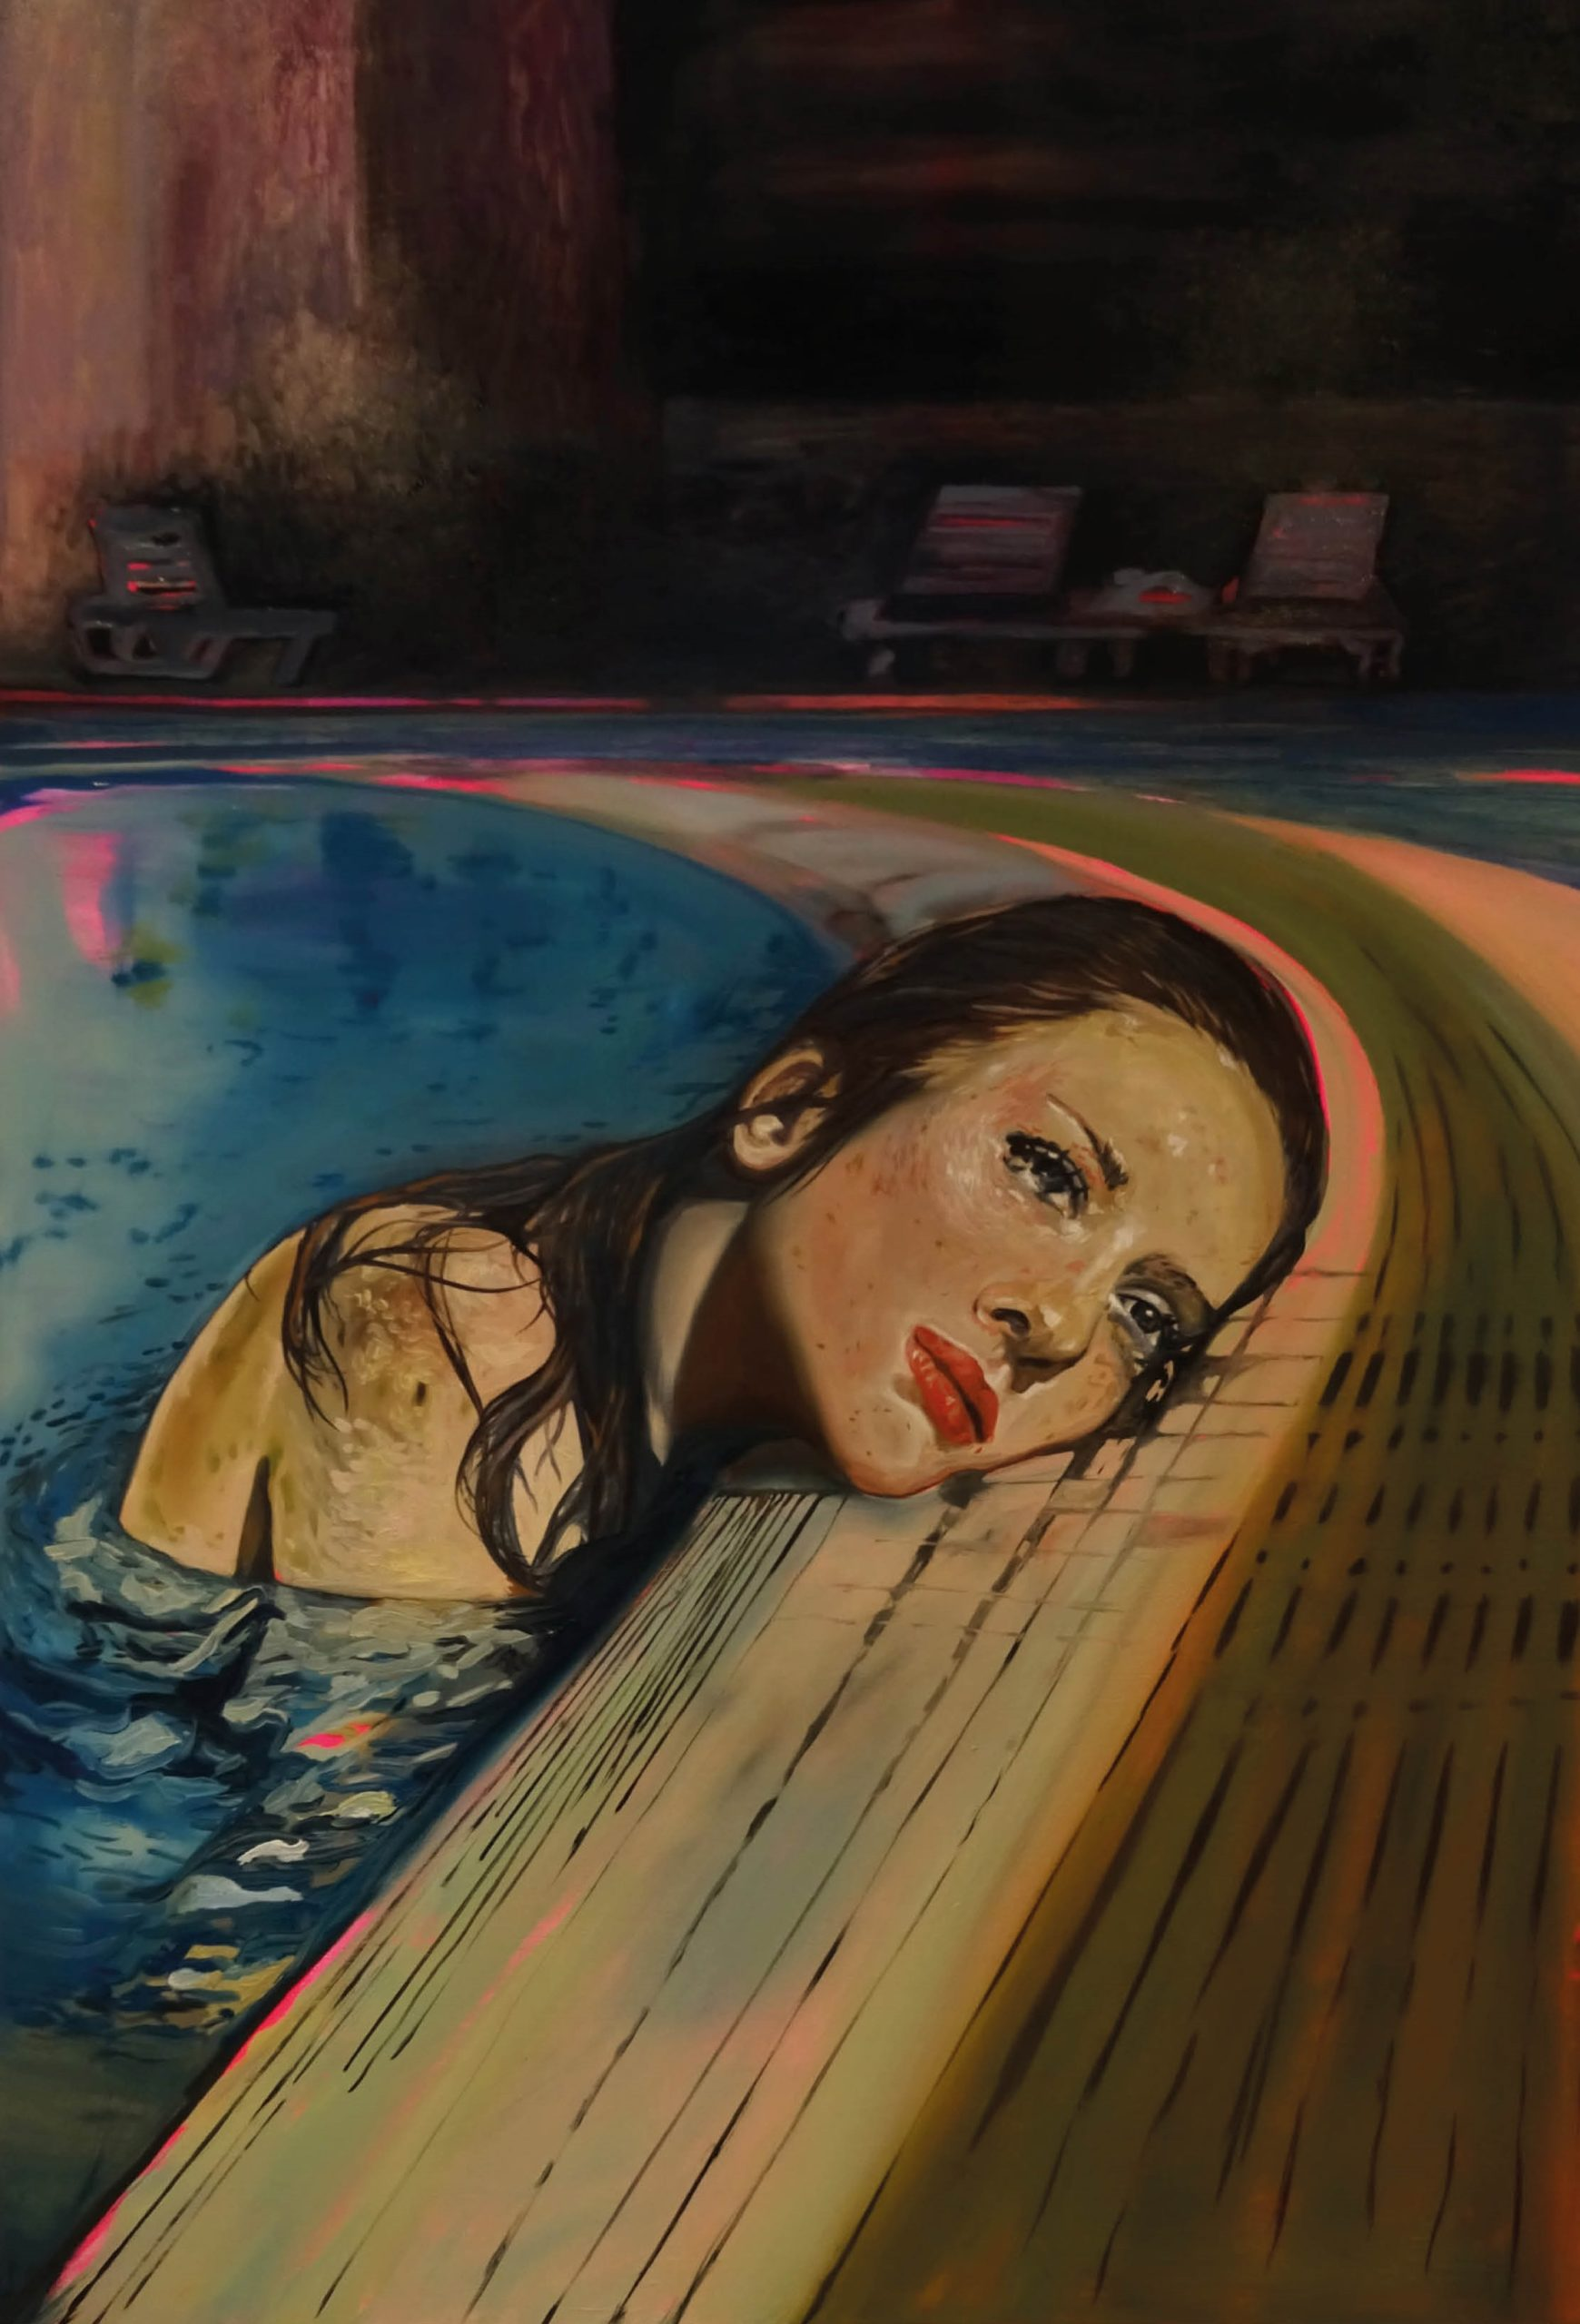 Blue Pool, 2019 Amanda Mulquiney Acrylic and Oil on Wood, 92 x 62 cm